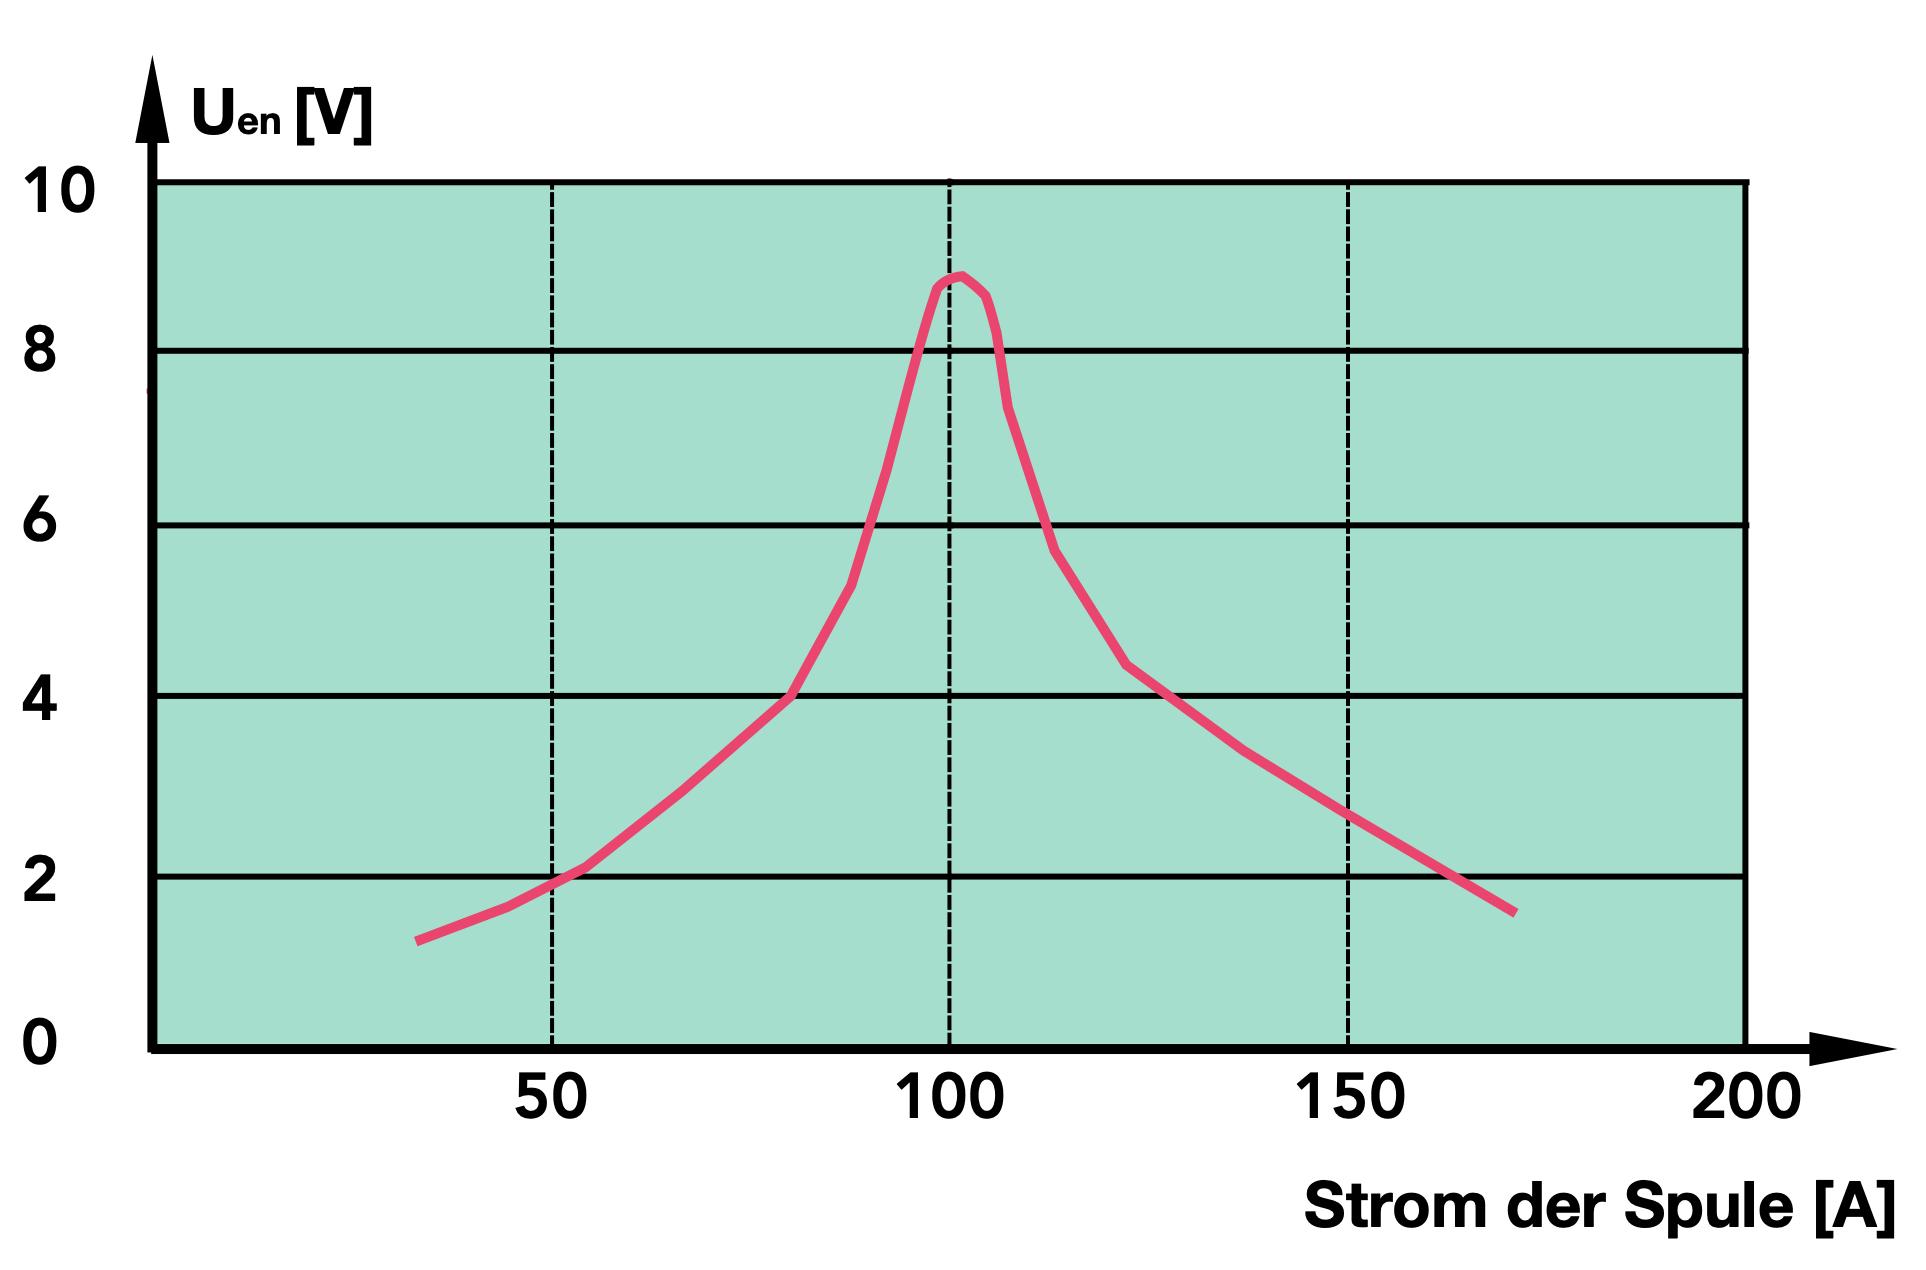 Sternpunktbehandlung, gelöschtes Netz, kompensiertes Netz, Petersenspule, Petersonspule, Erdschlussdrossel, Löschspule, Erdschlusskompensation, kapazitiver Erdschlussstrom, Reststrom, Restwirkstrom, Verstimmungsgrad